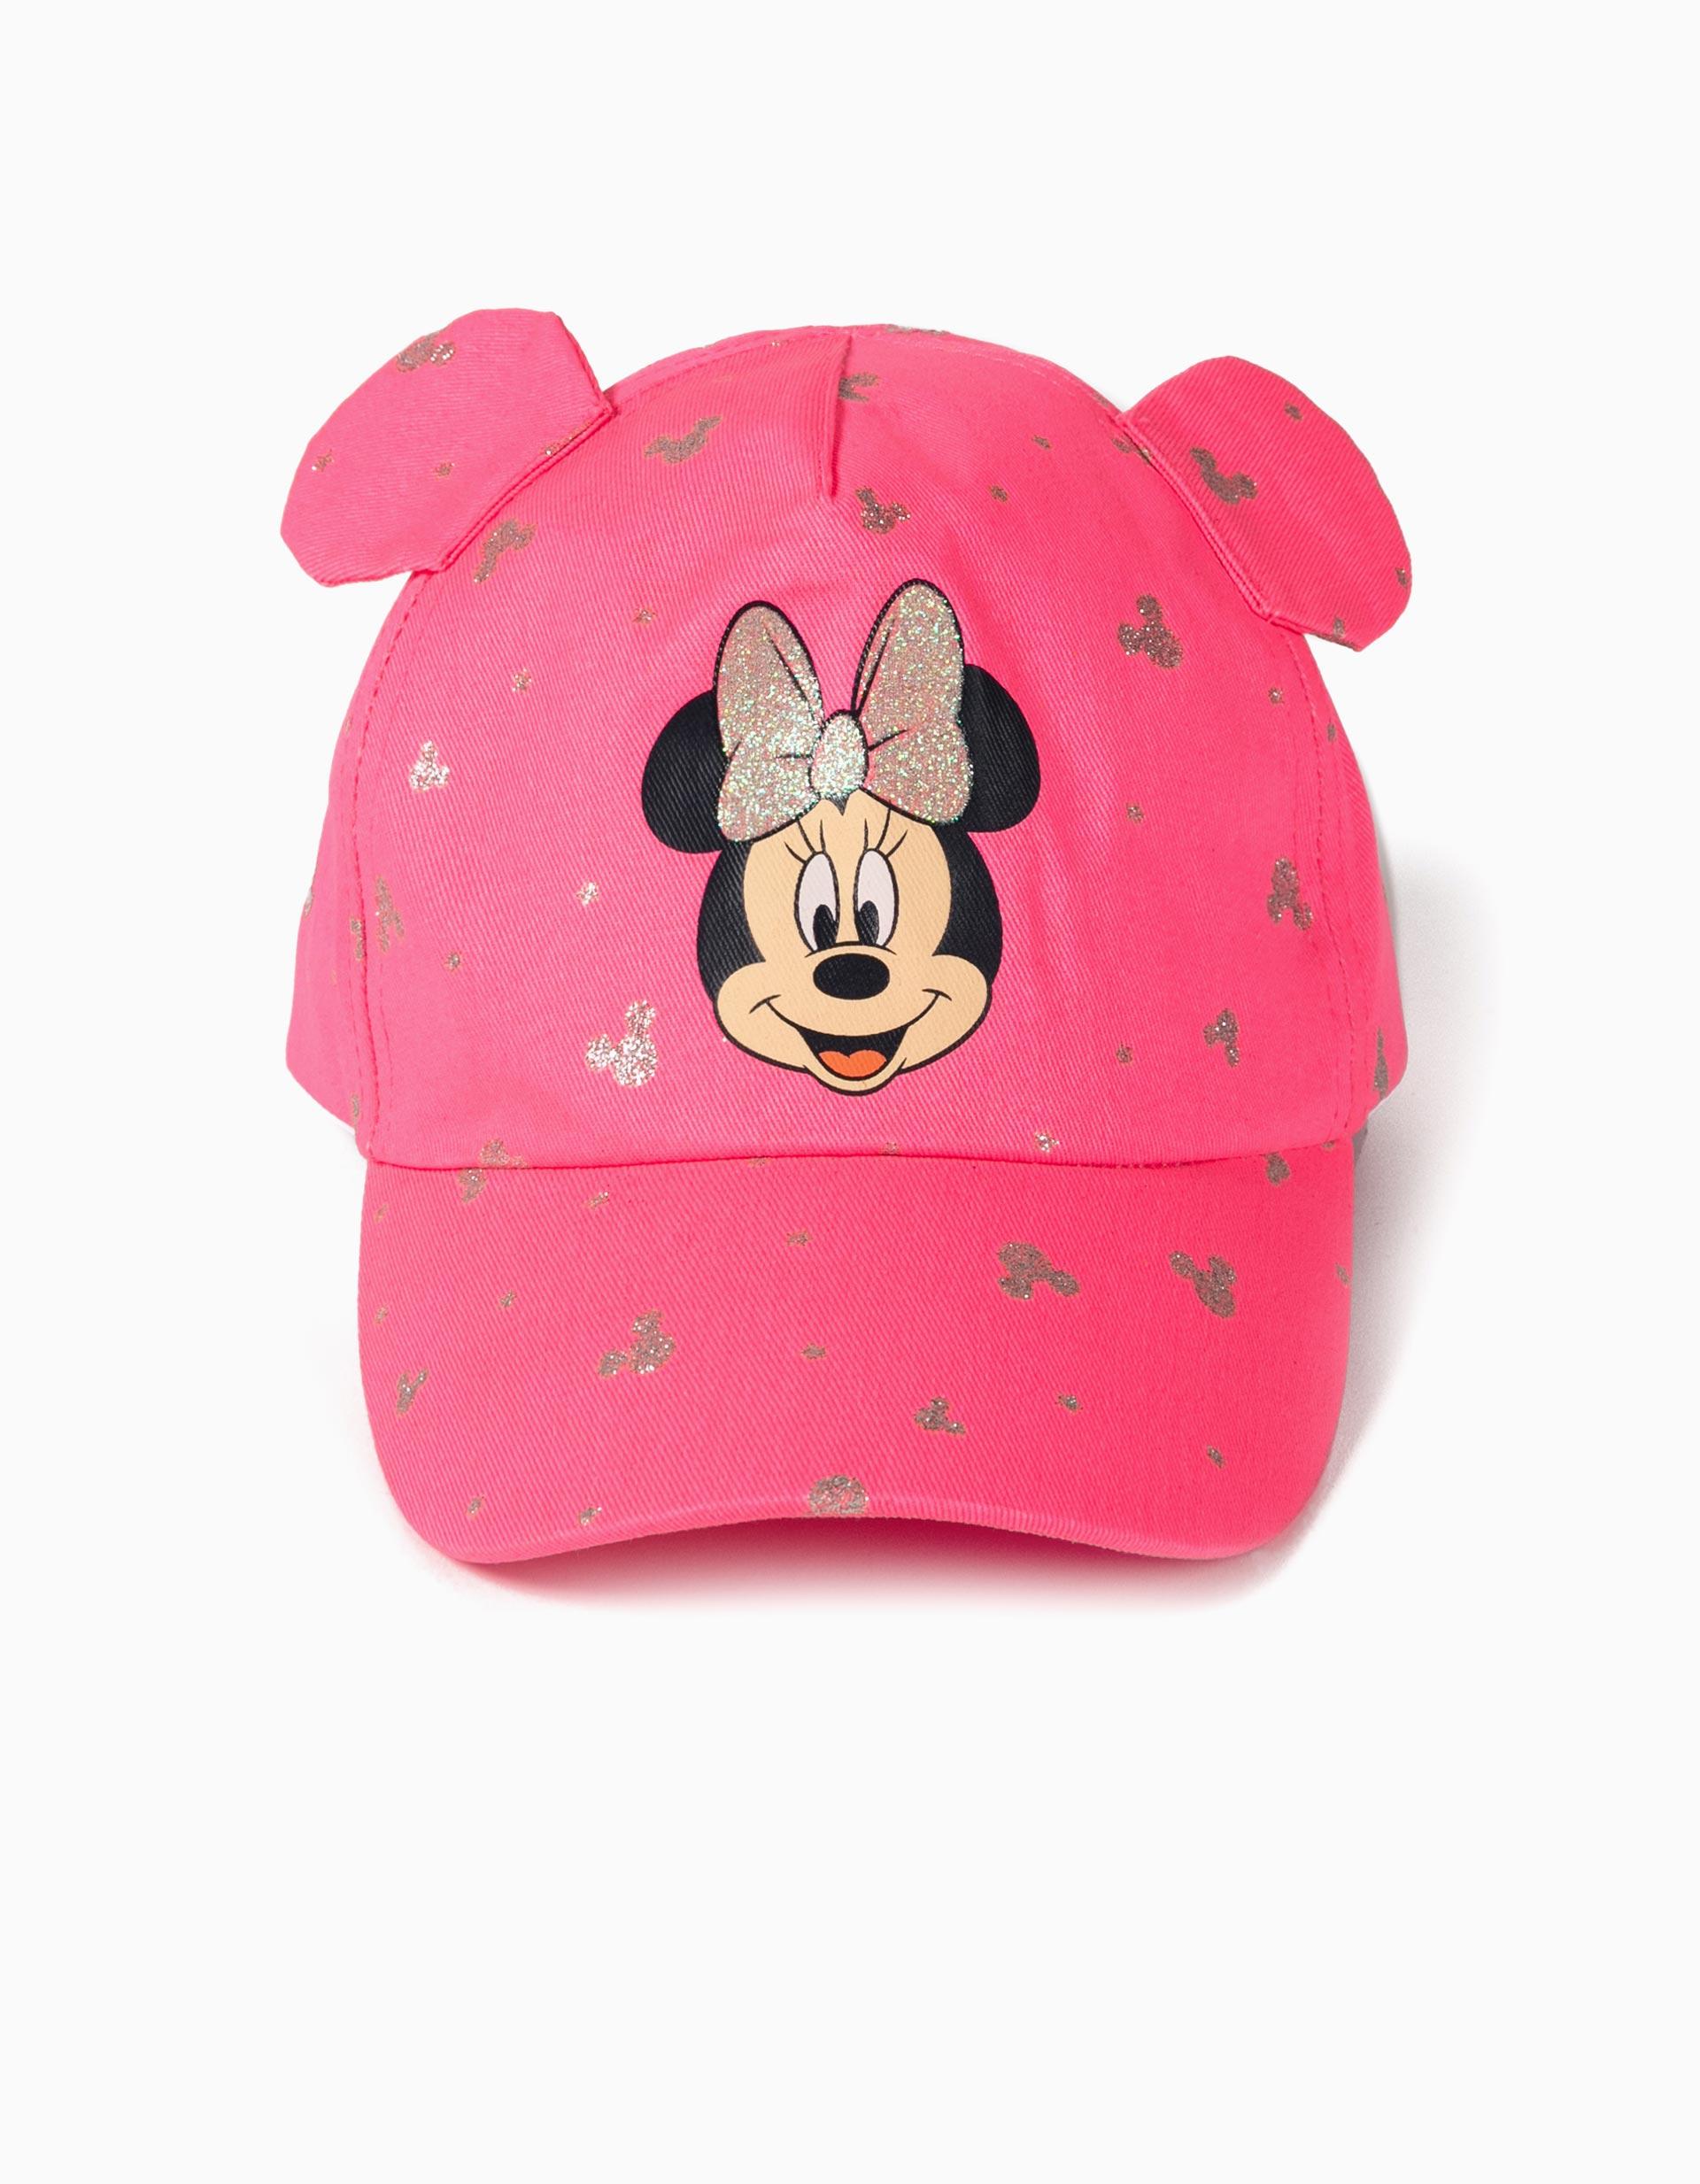 Boné para Menina 'Minnie Mouse', Rosa